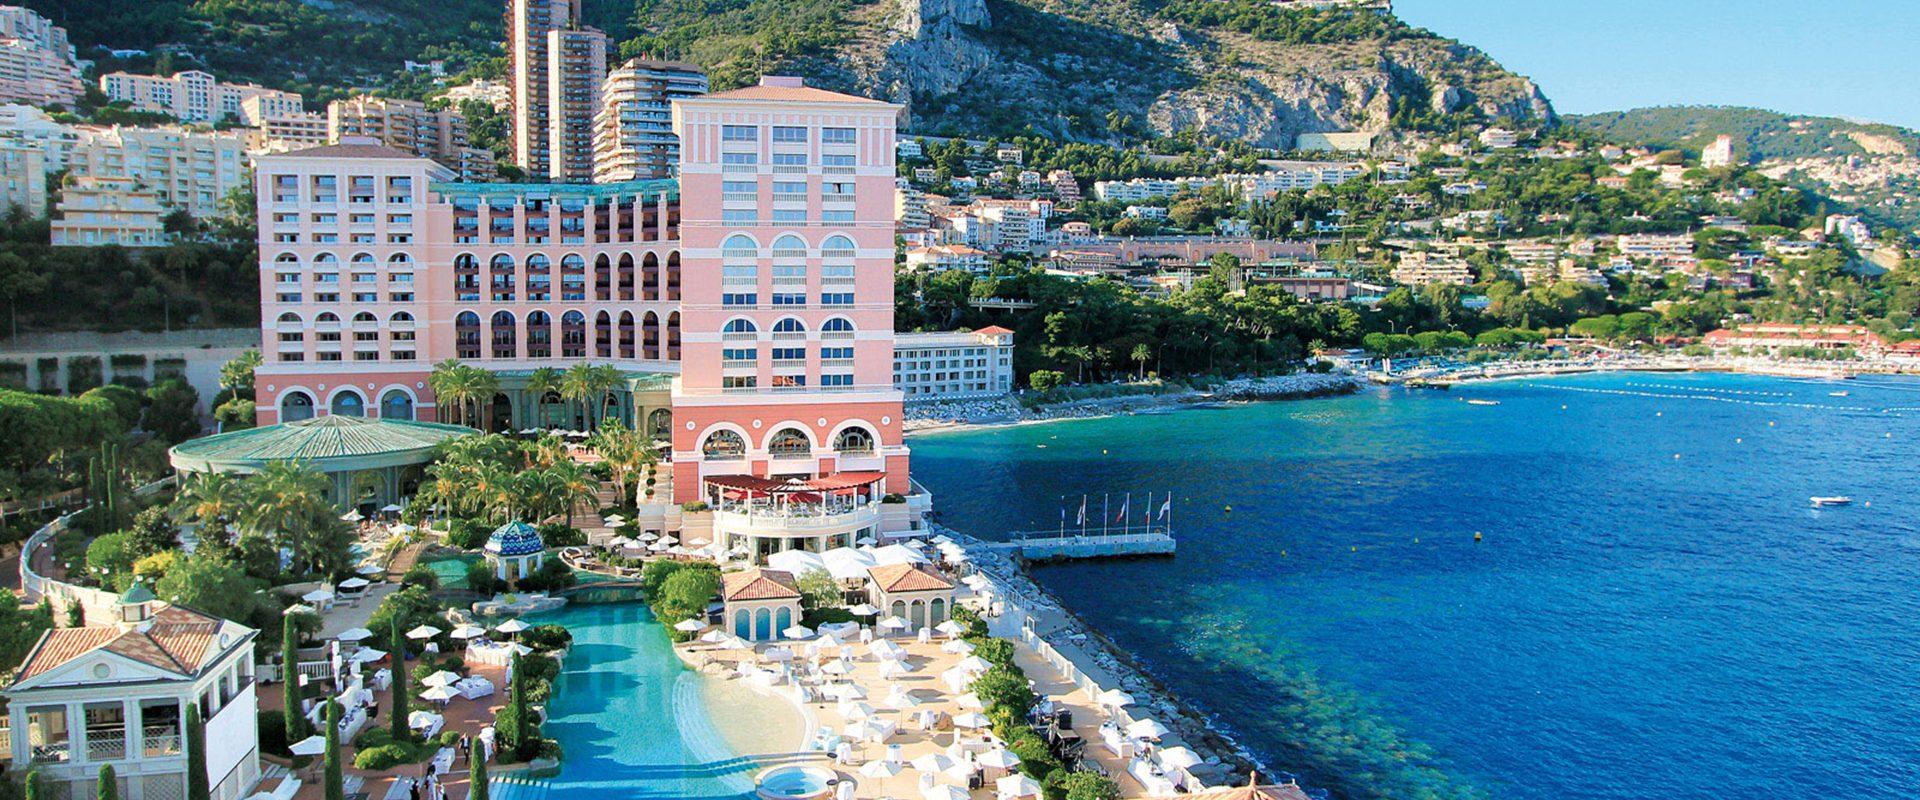 Monaco 1 - Top-DRH Monaco - Convention professionnelle - Ressources Humaines